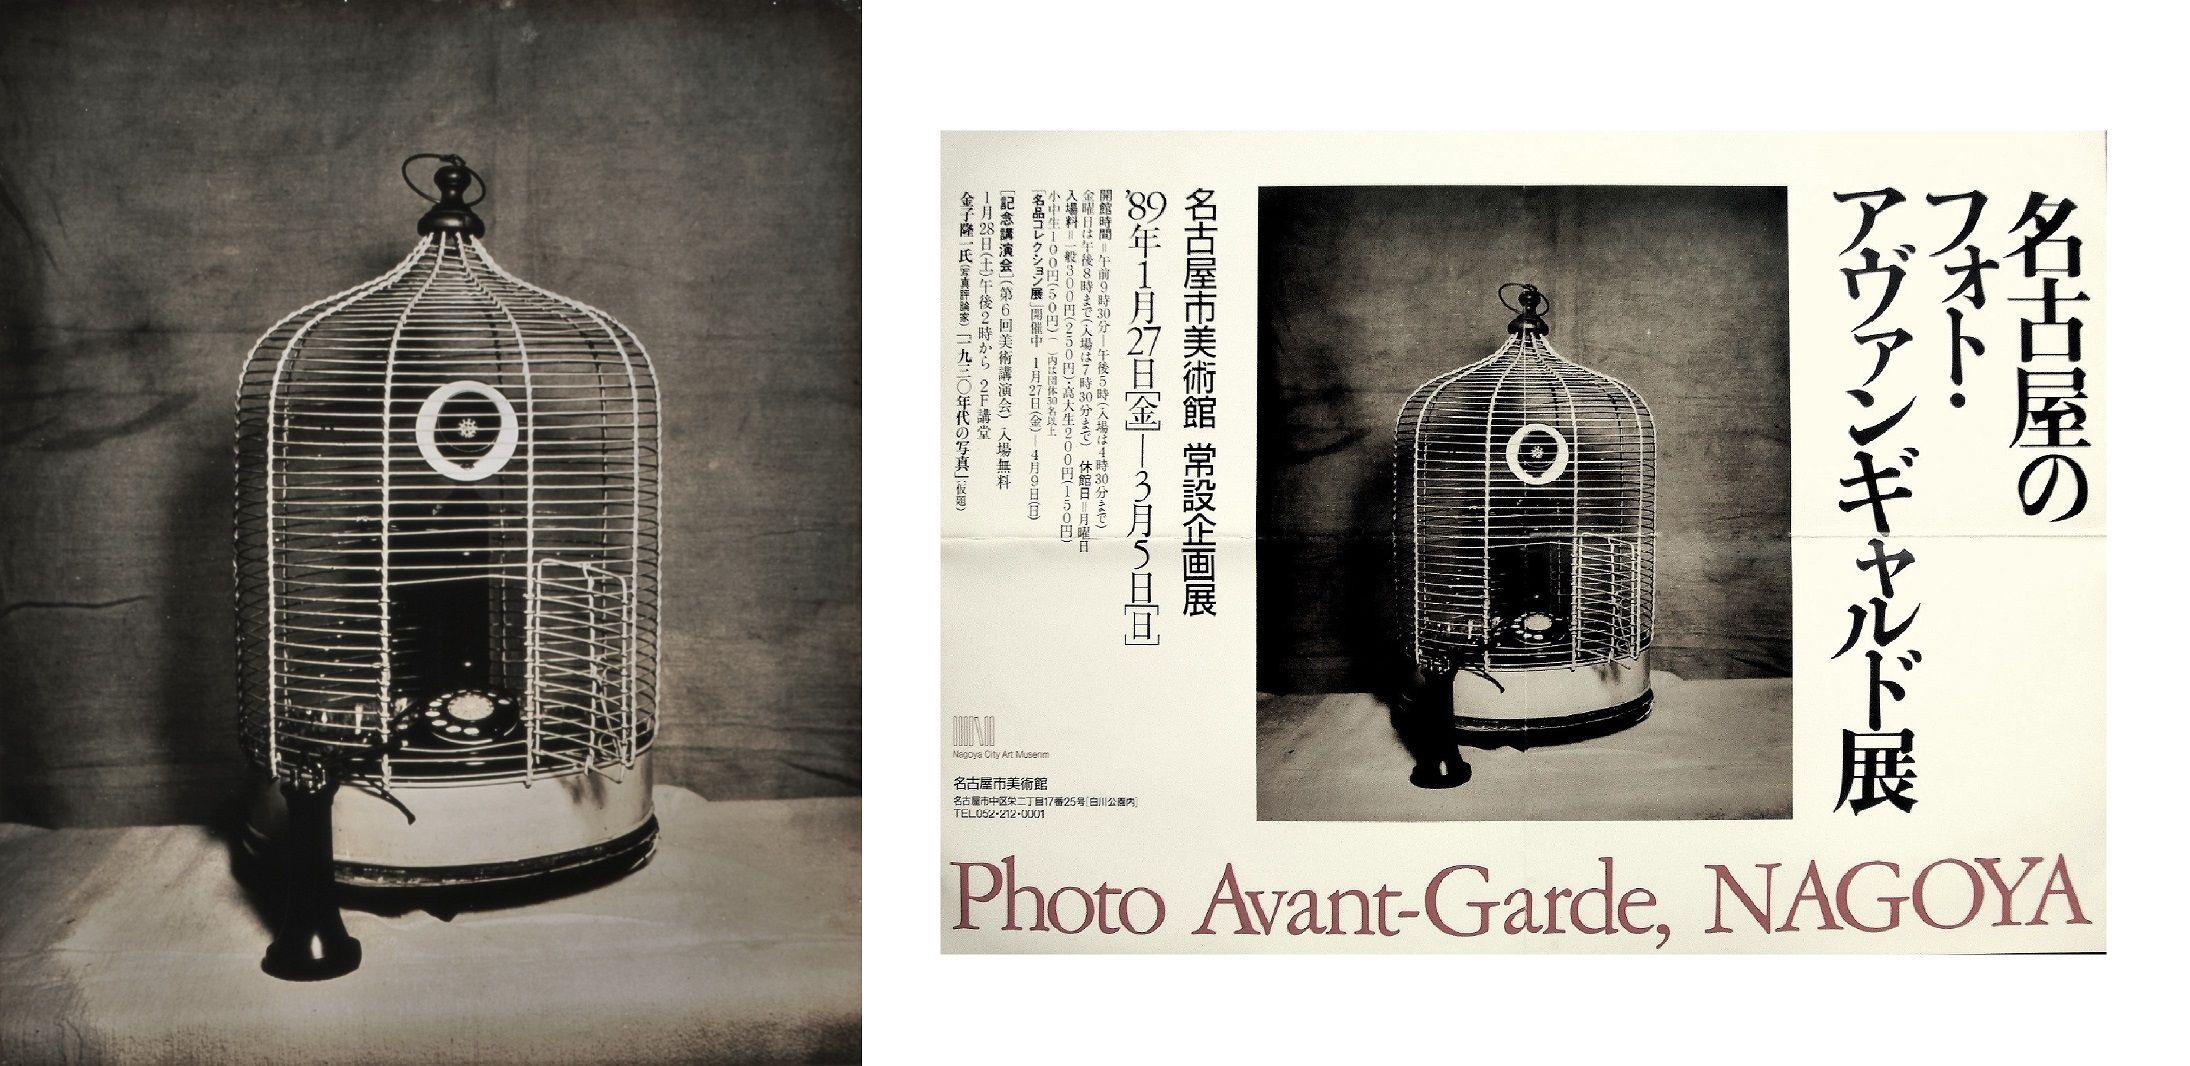 山本悍右 伽藍の鳥籠 昭和年 Buddhist Temples Birdcage - Private museums in usa